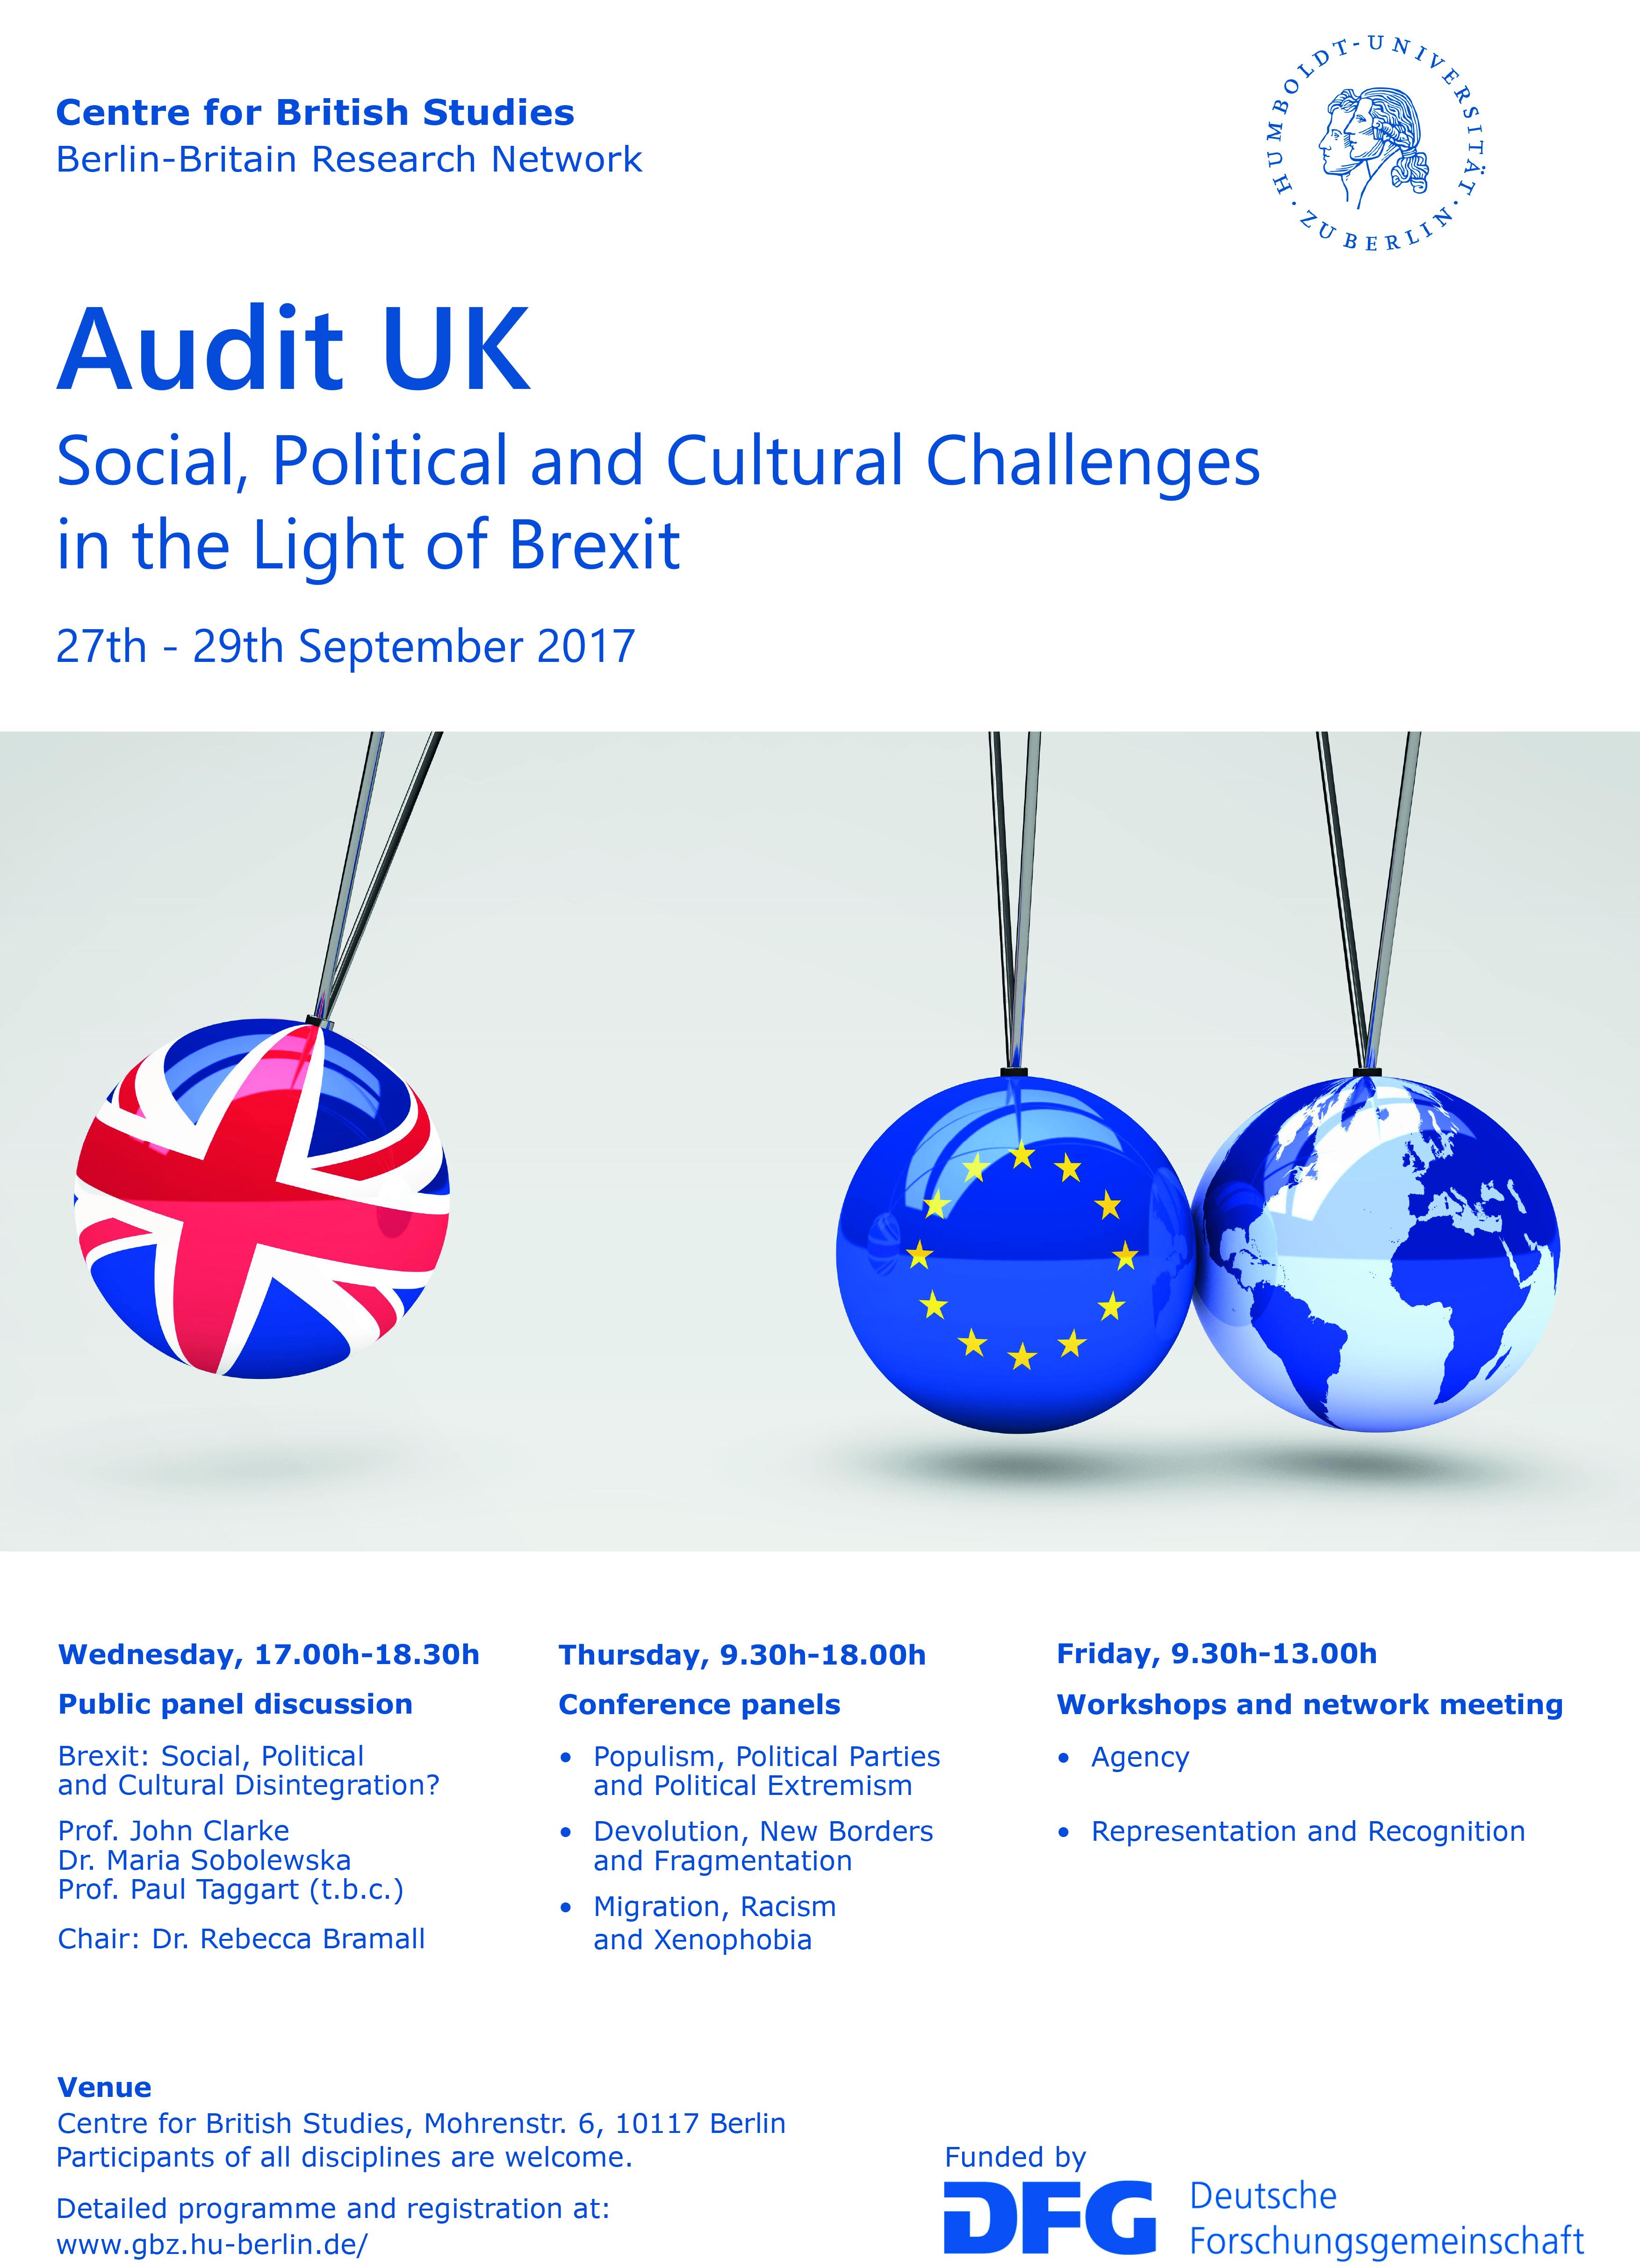 Audit UK Poster